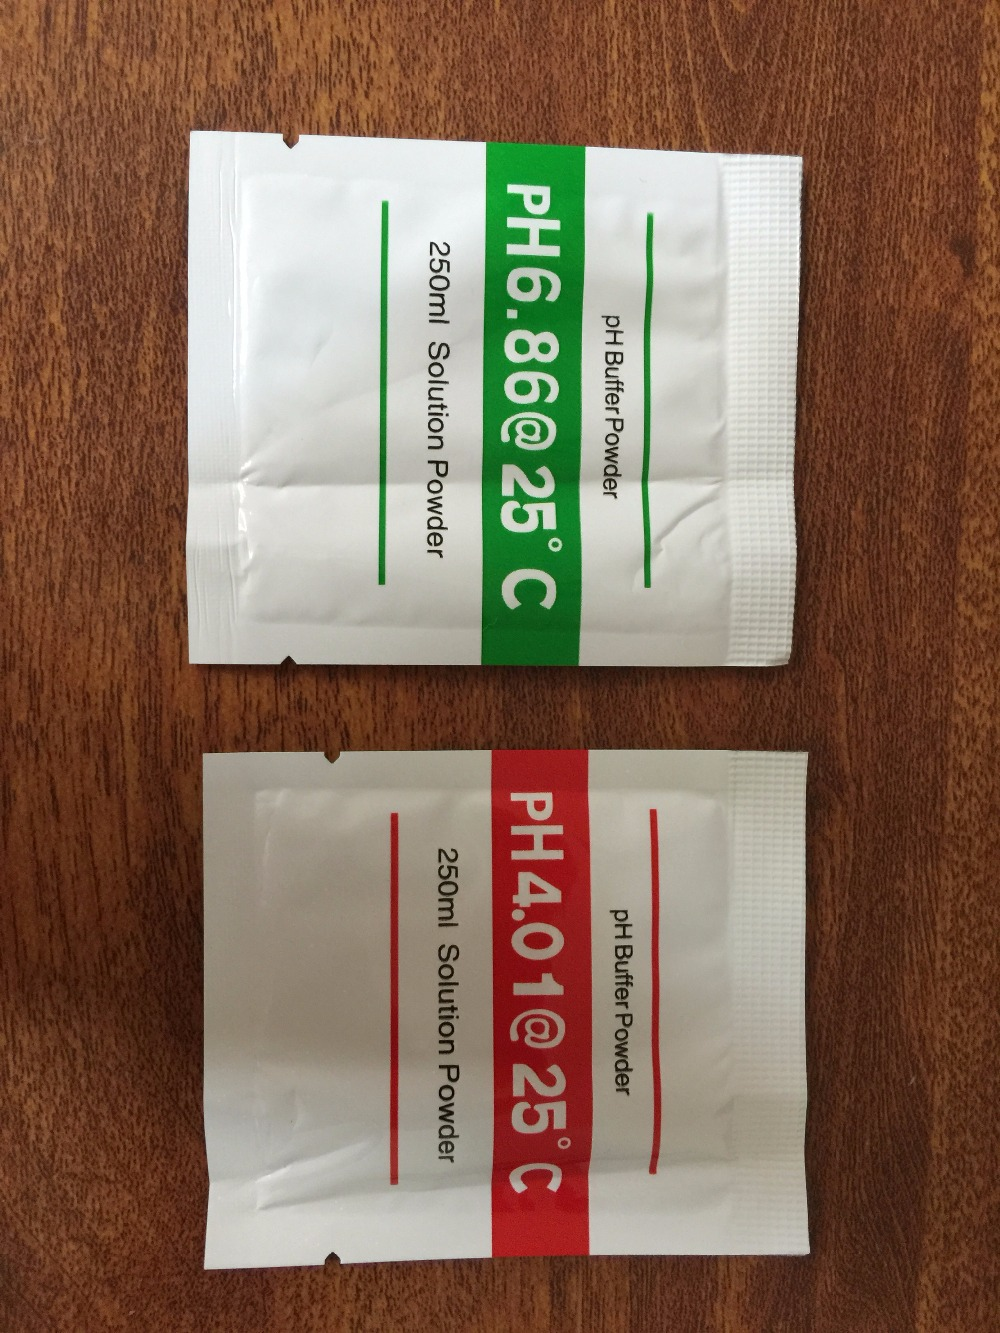 20pcs PH Buffer Powder for PH Test Meter Measure Calibration Solution 4.01 6.86pH